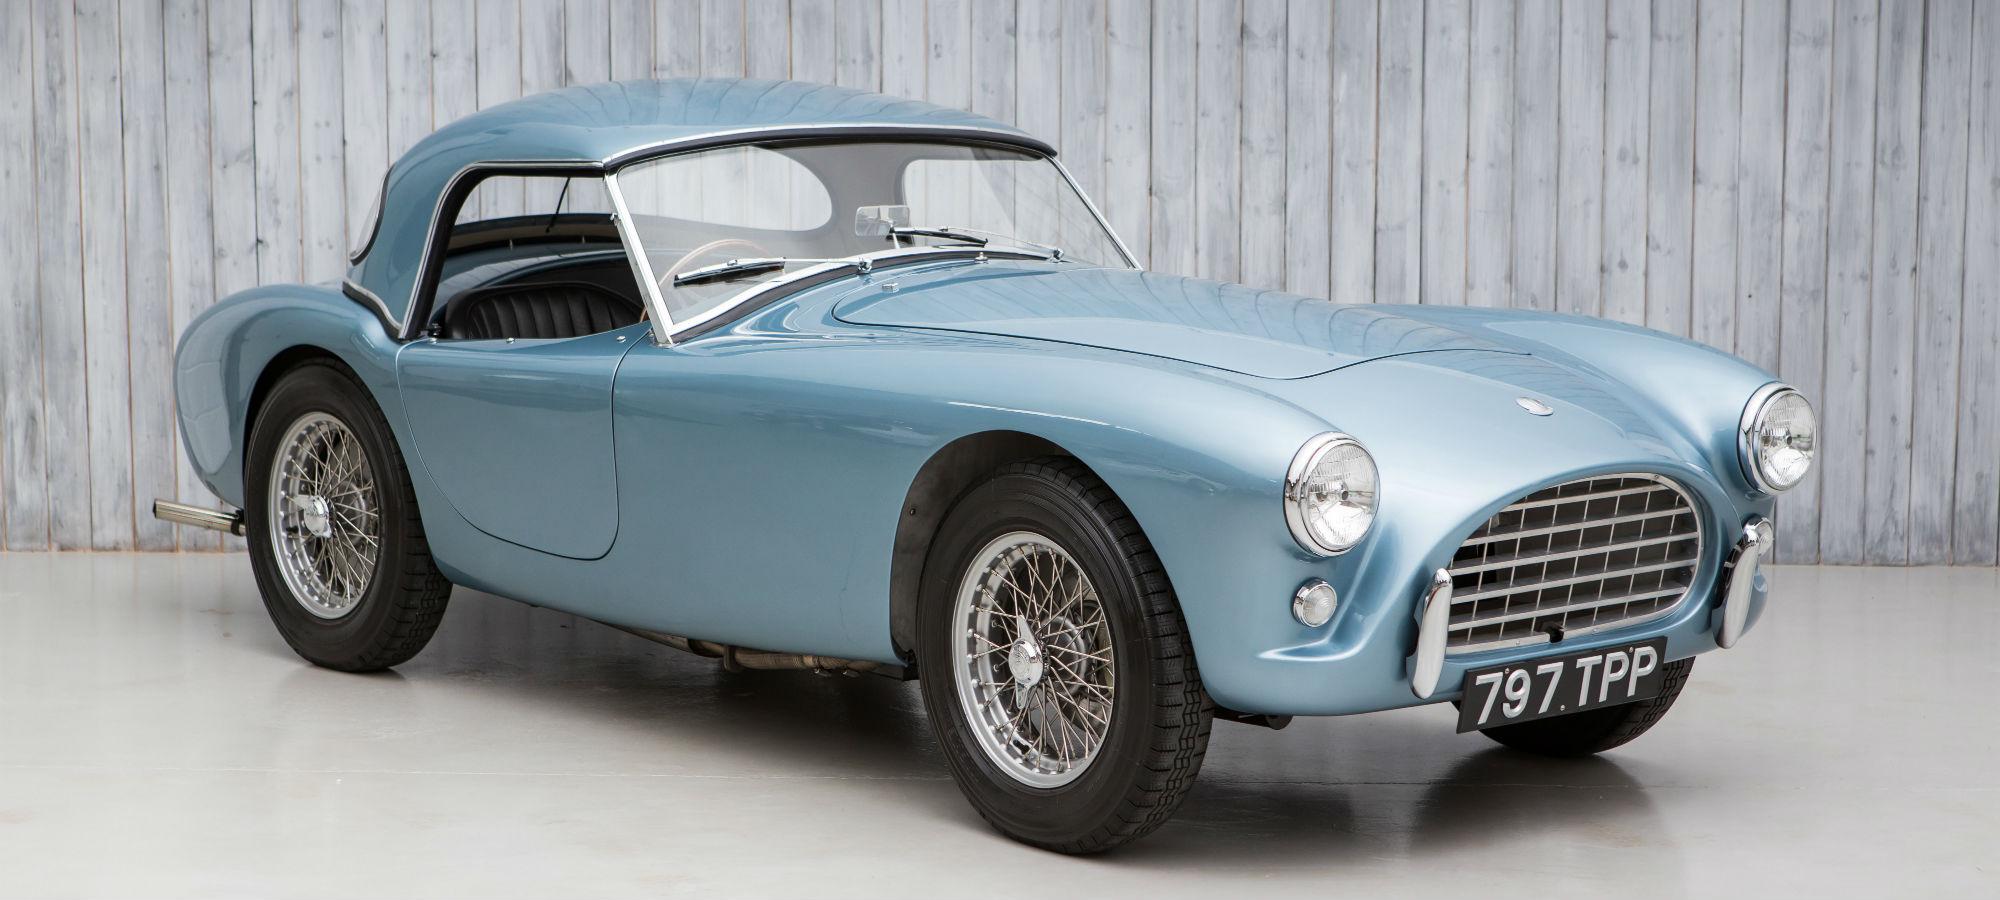 1961 AC Ace Bristol